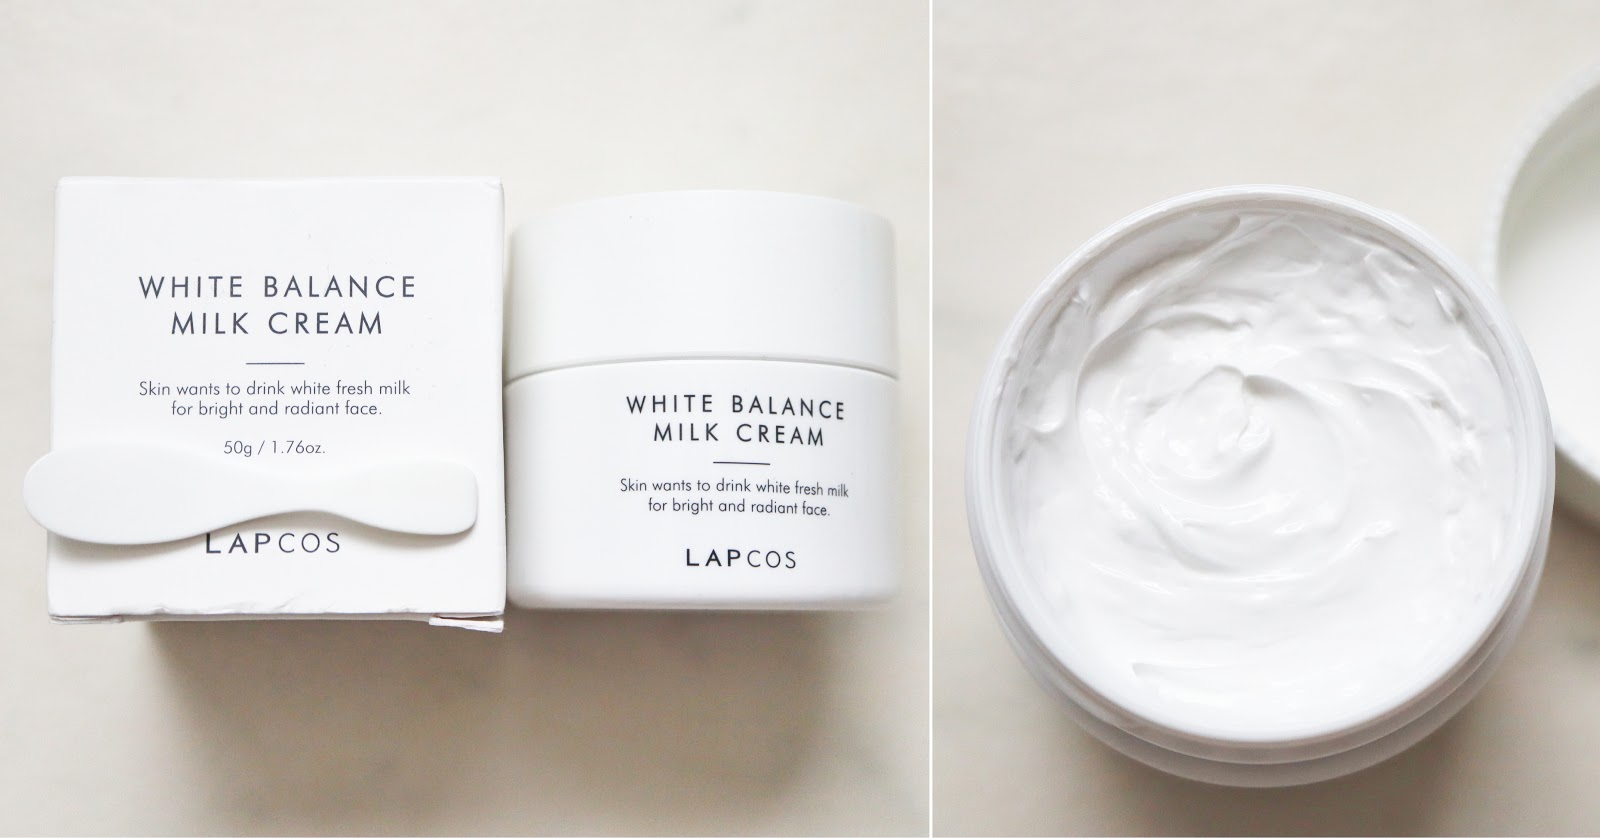 Lapcos white balance milk cream